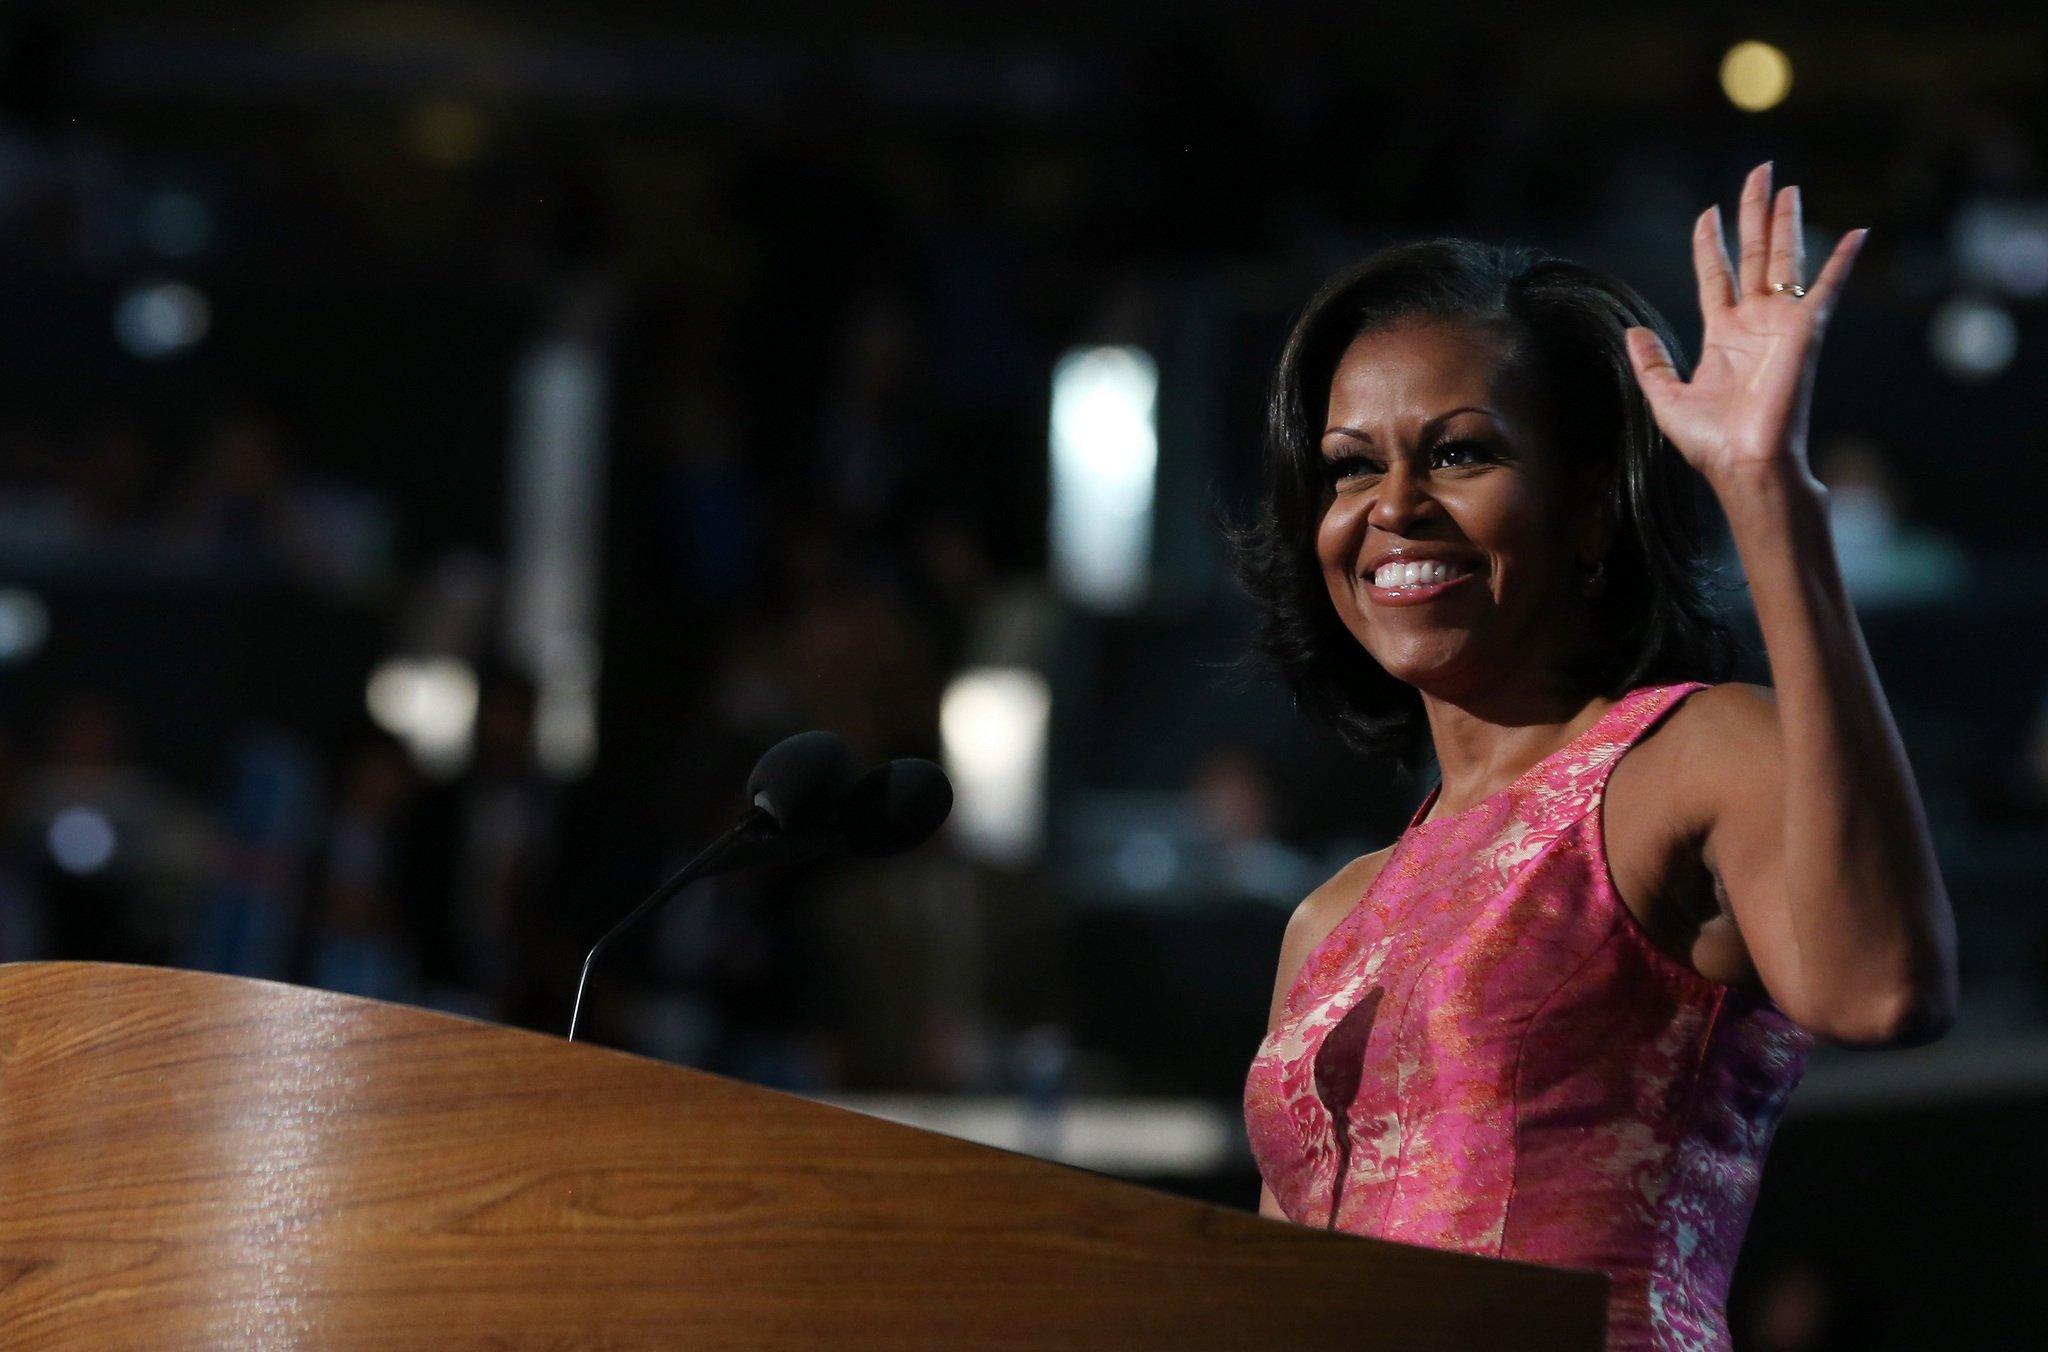 Michelle obama hugs team usa basketball wallpaper - harga samsung 18150 galaxy wallpapers